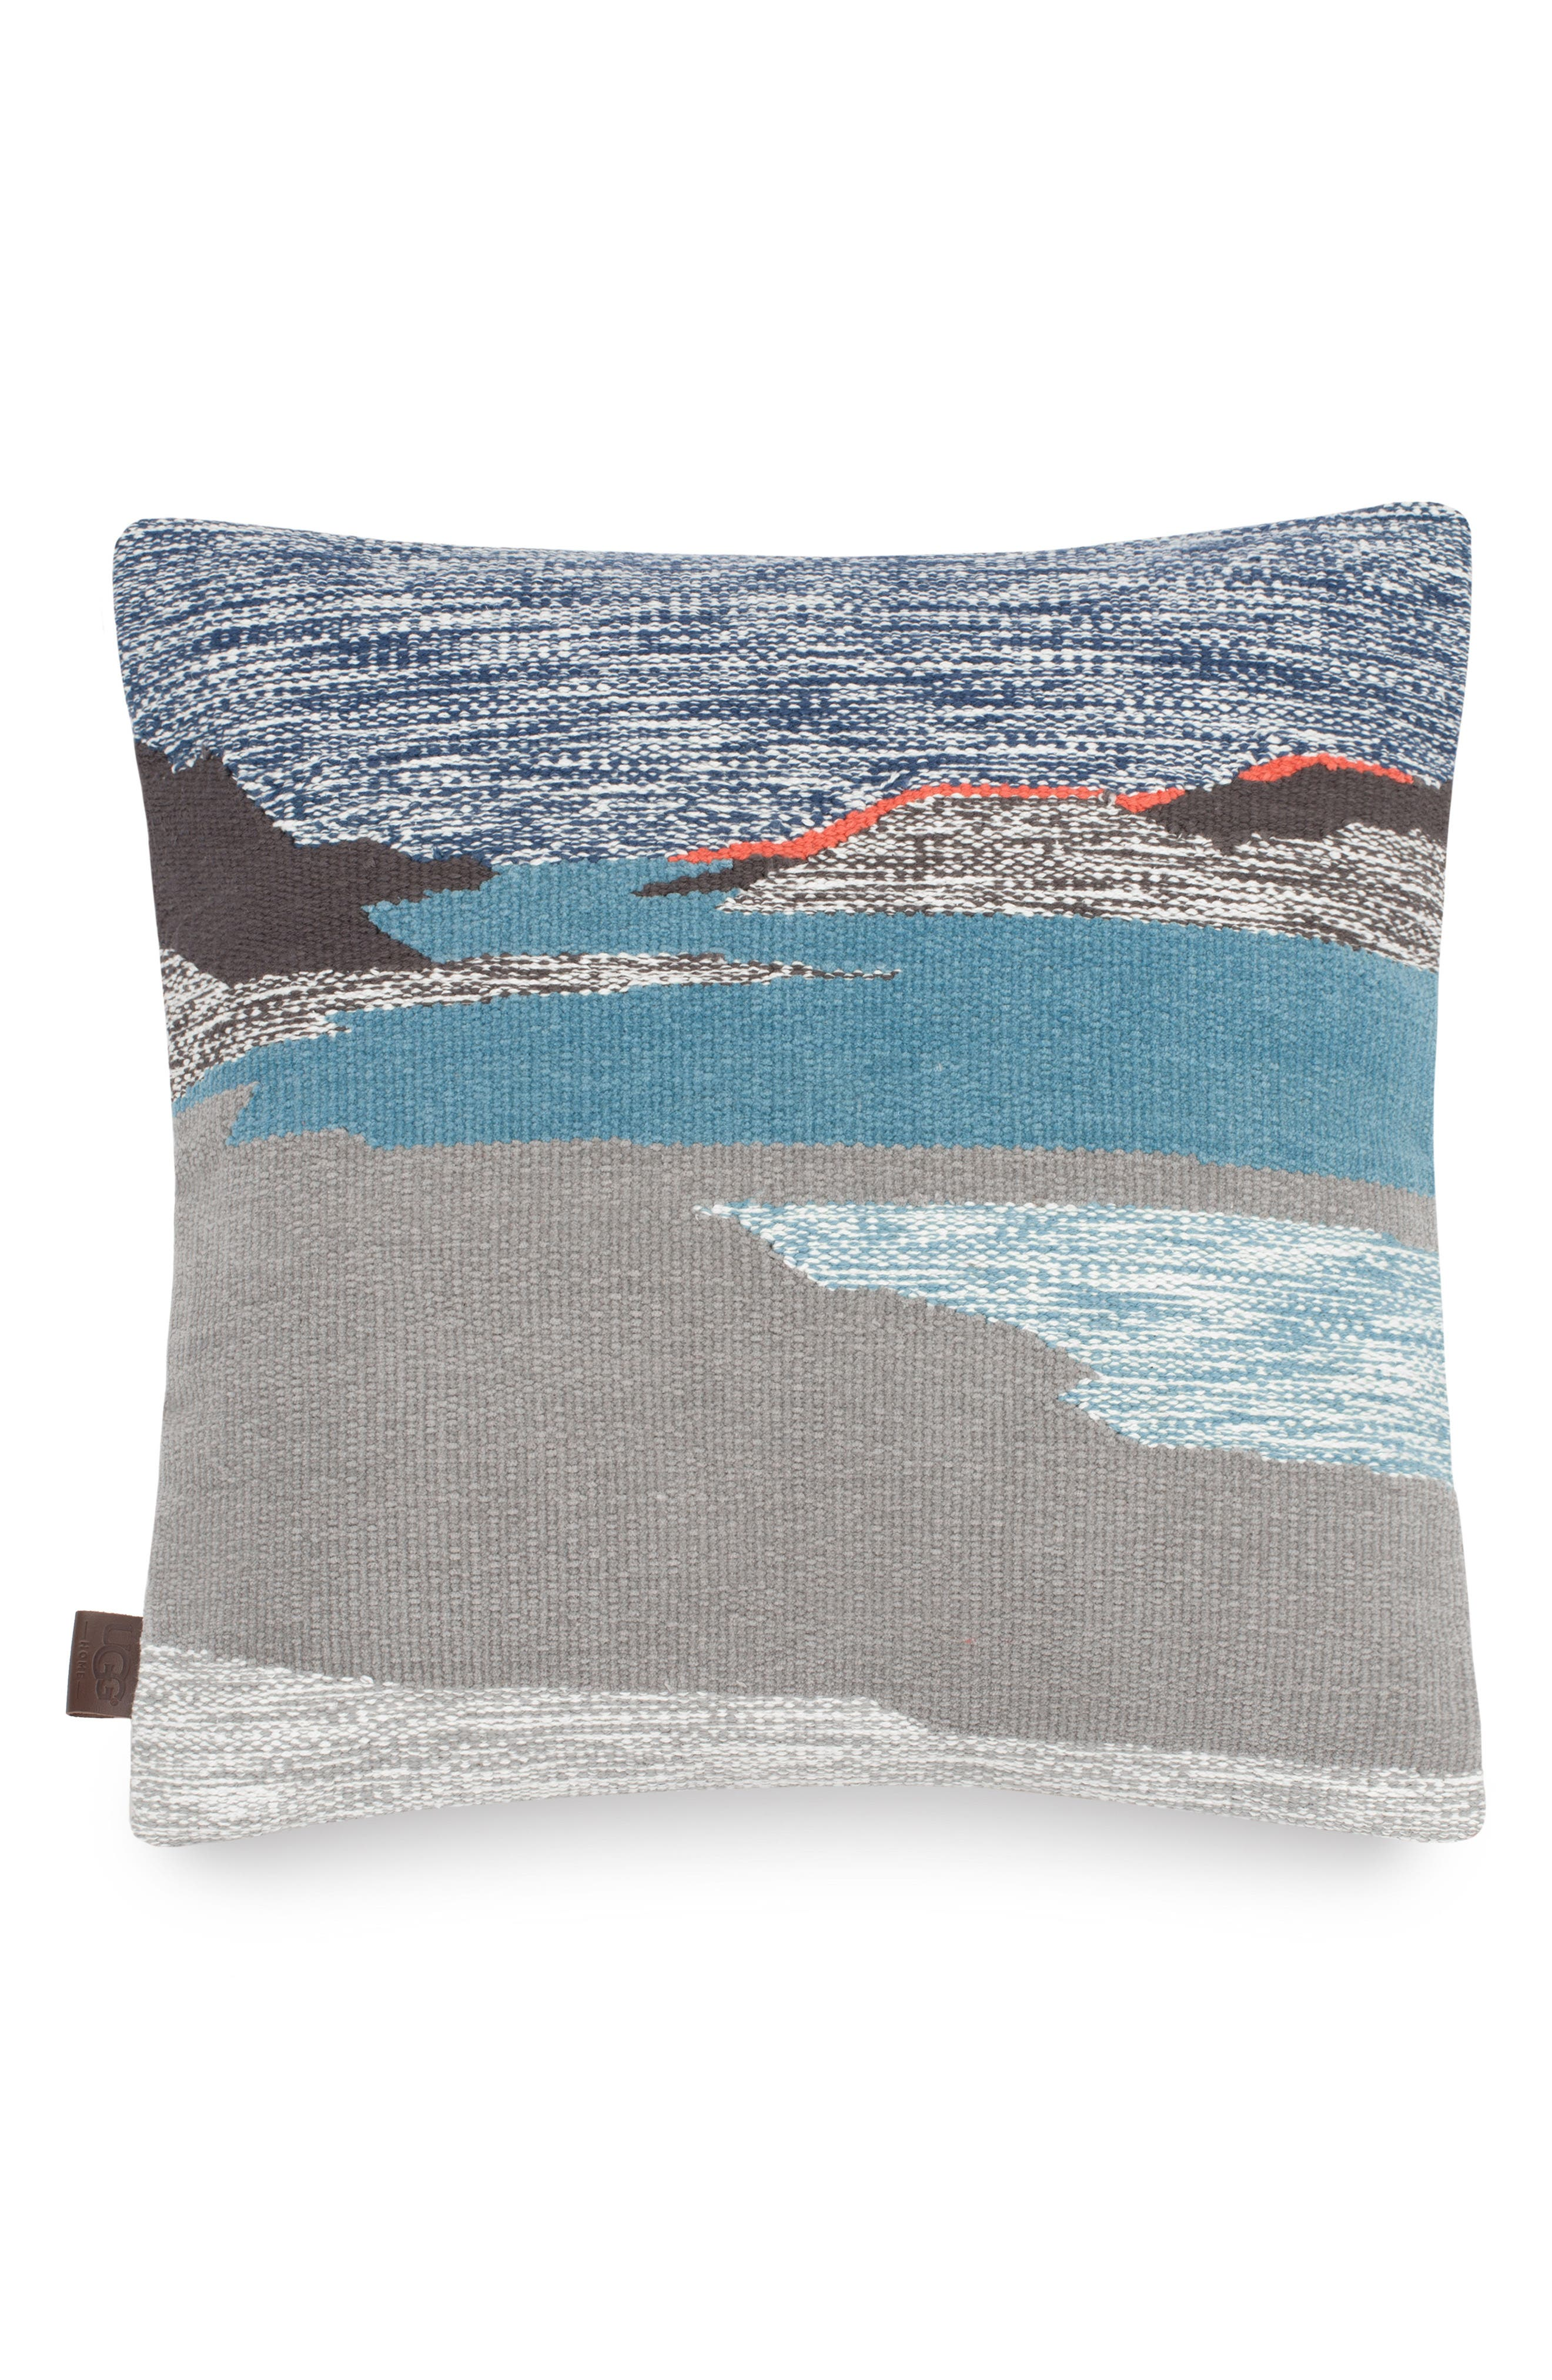 Daydream Landscape Accent Pillow,                             Main thumbnail 1, color,                             Grey Multi